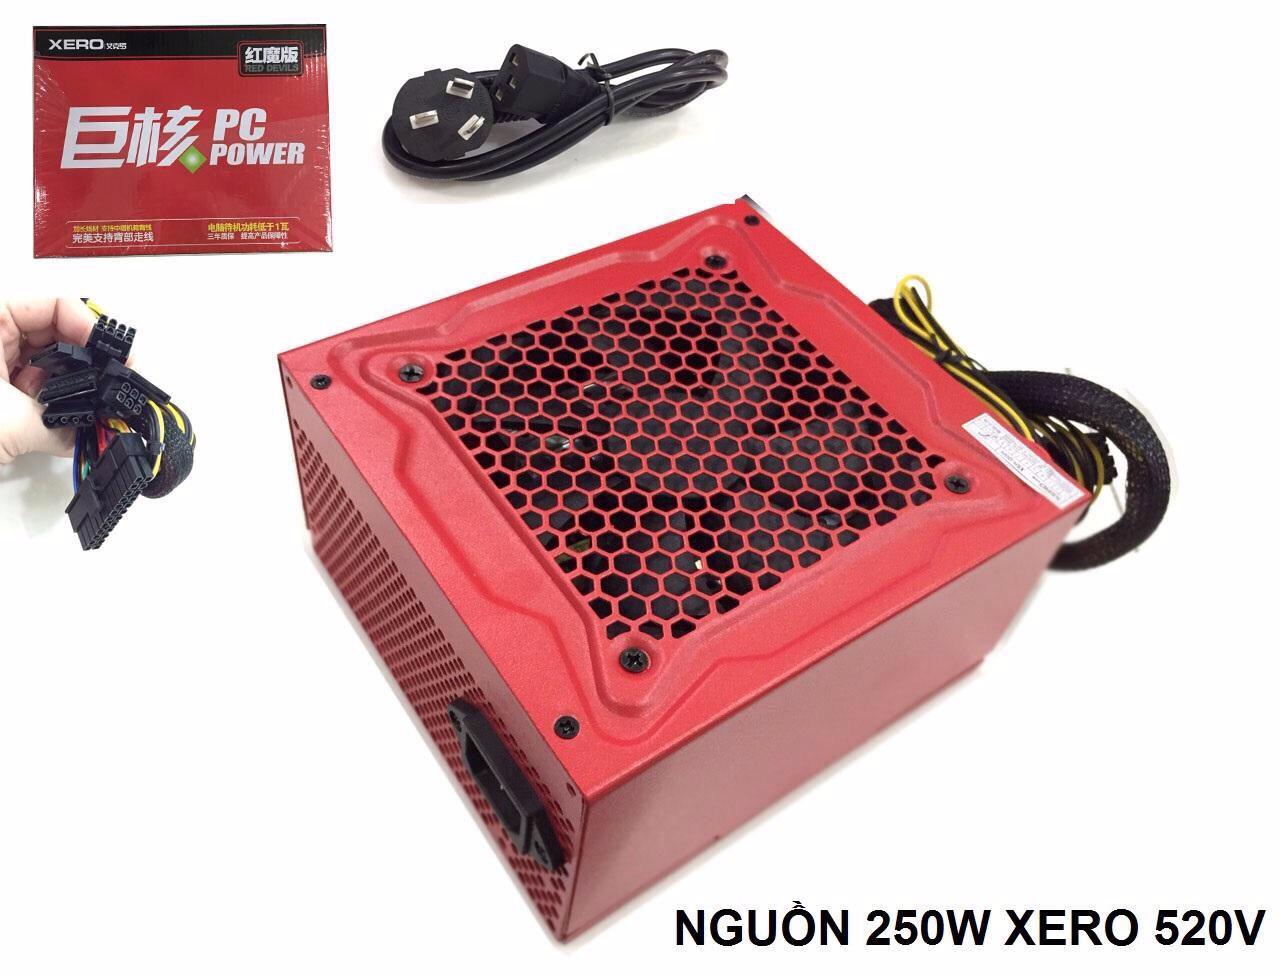 Nguồn 250W Xero 520V